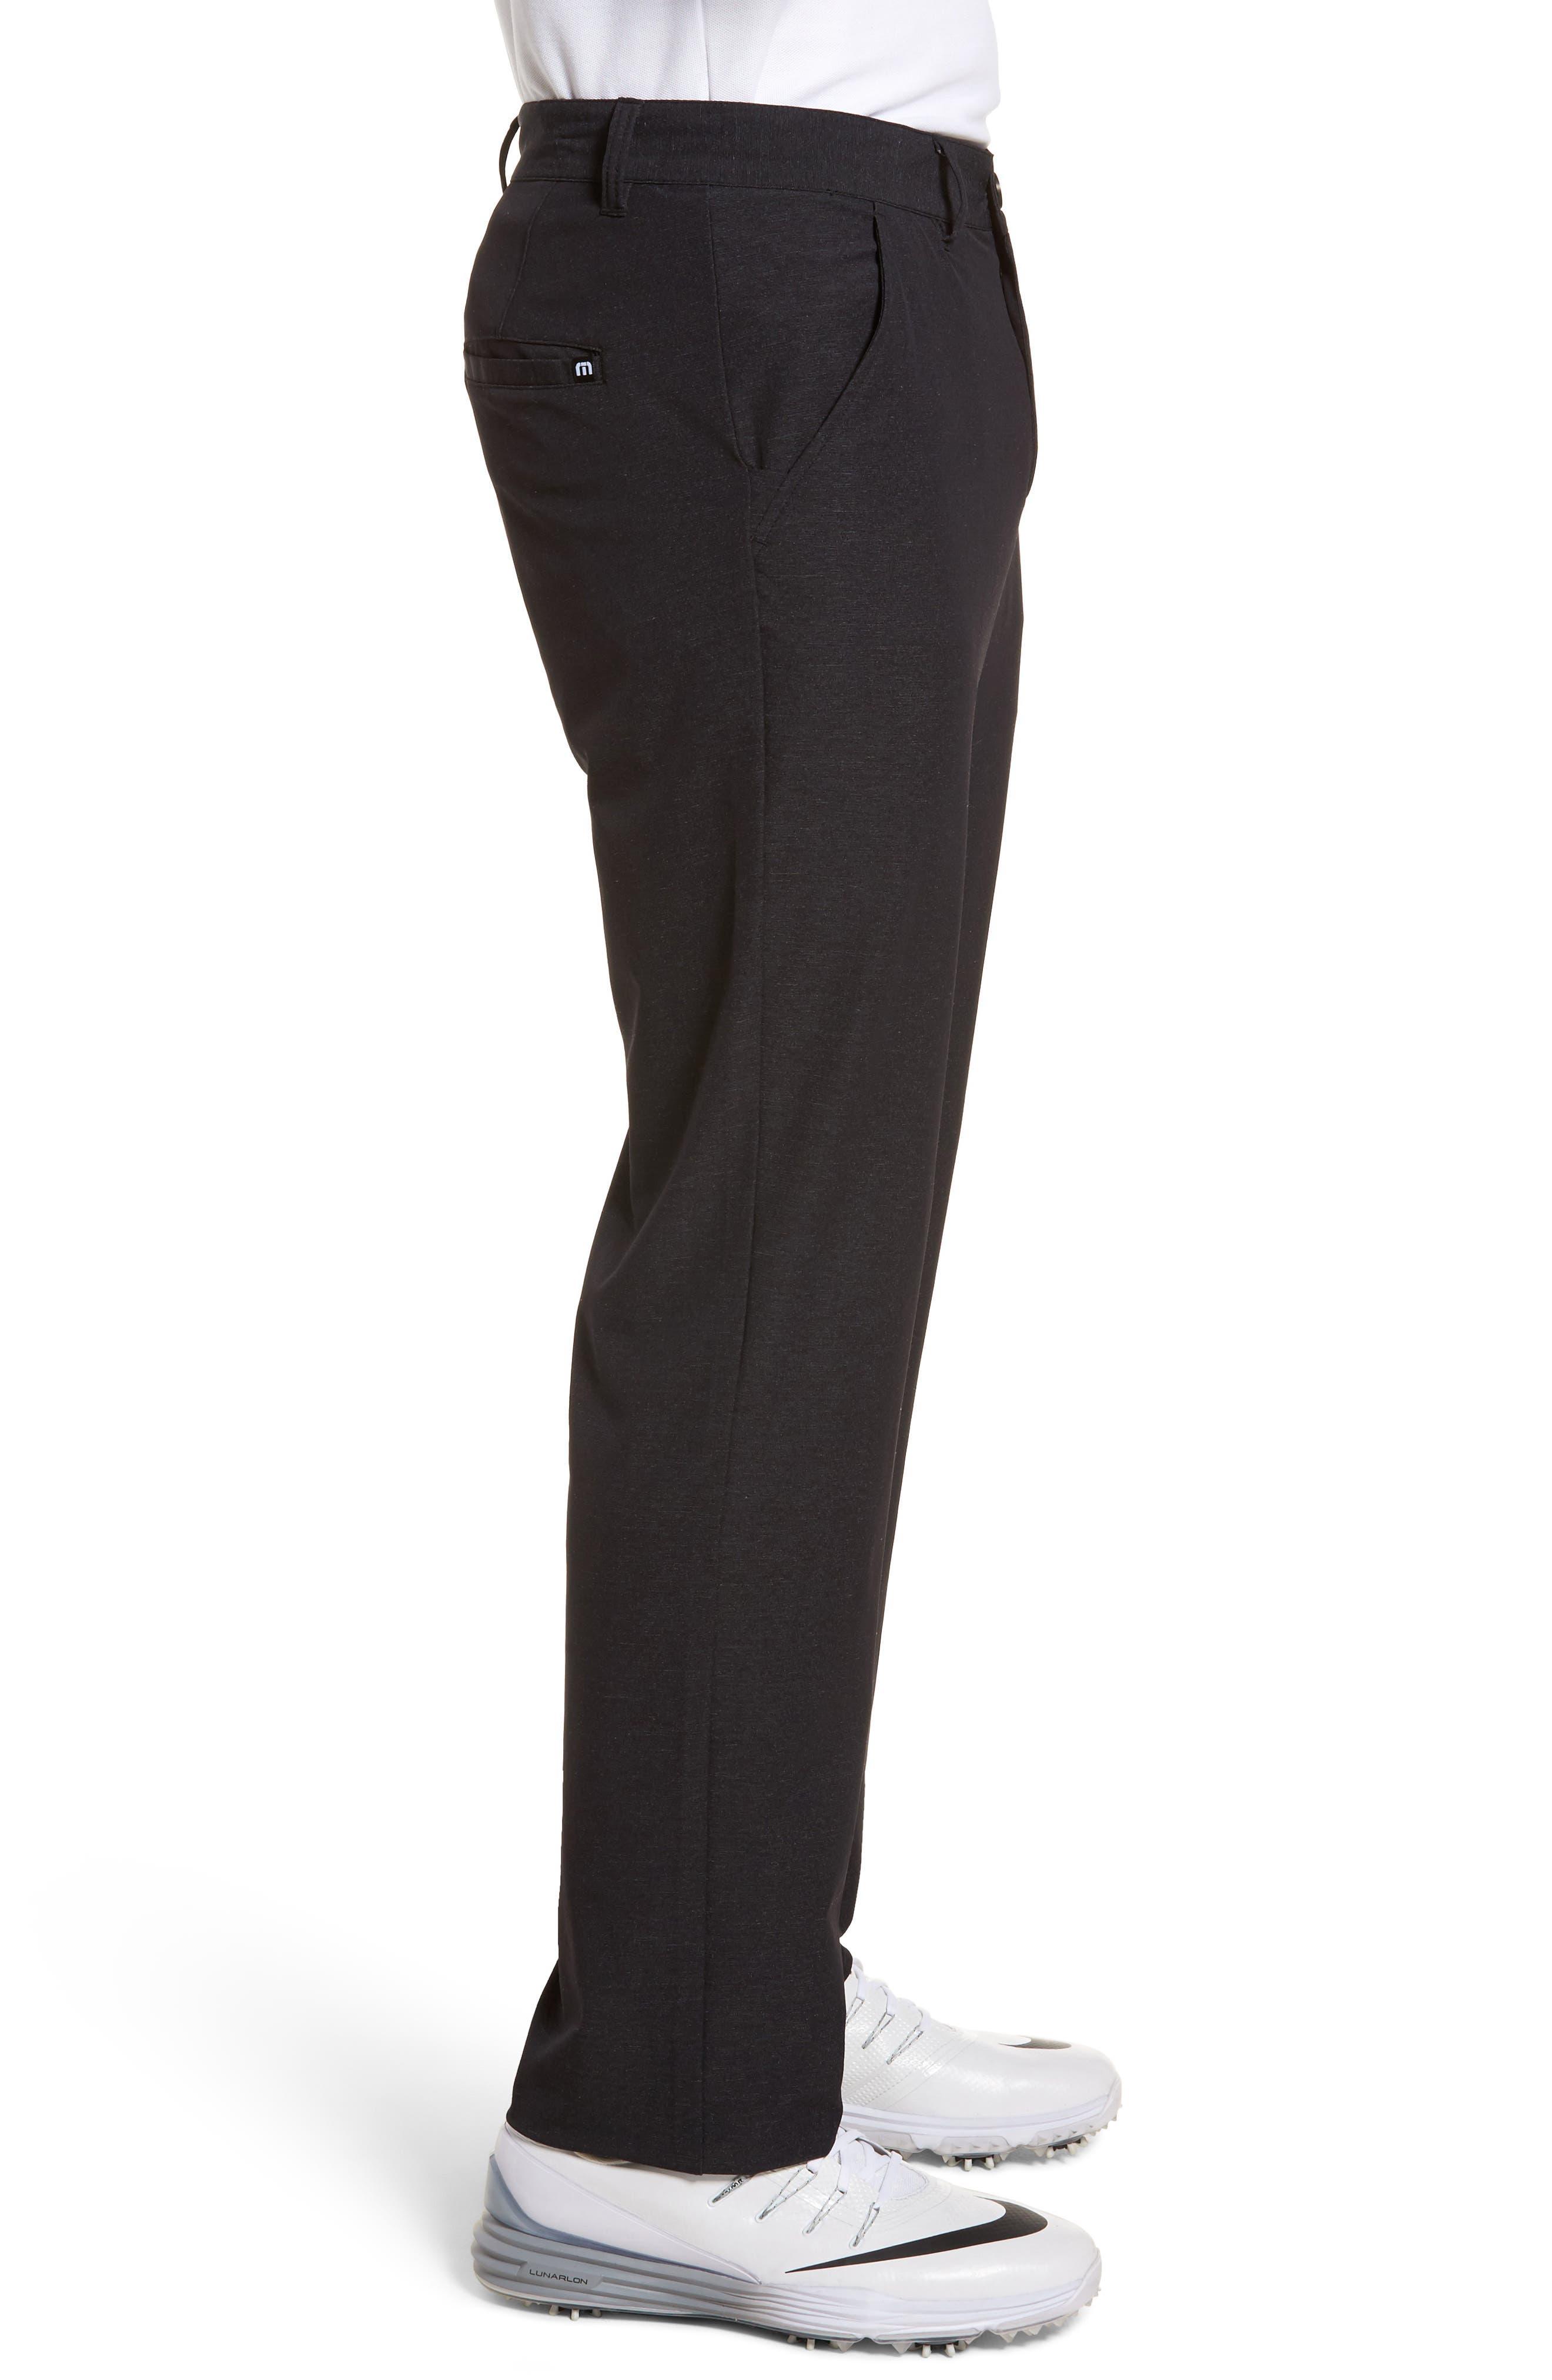 Mercurio Regular Fit Four-Way Stretch Pants,                             Alternate thumbnail 3, color,                             HEATHER BLACK